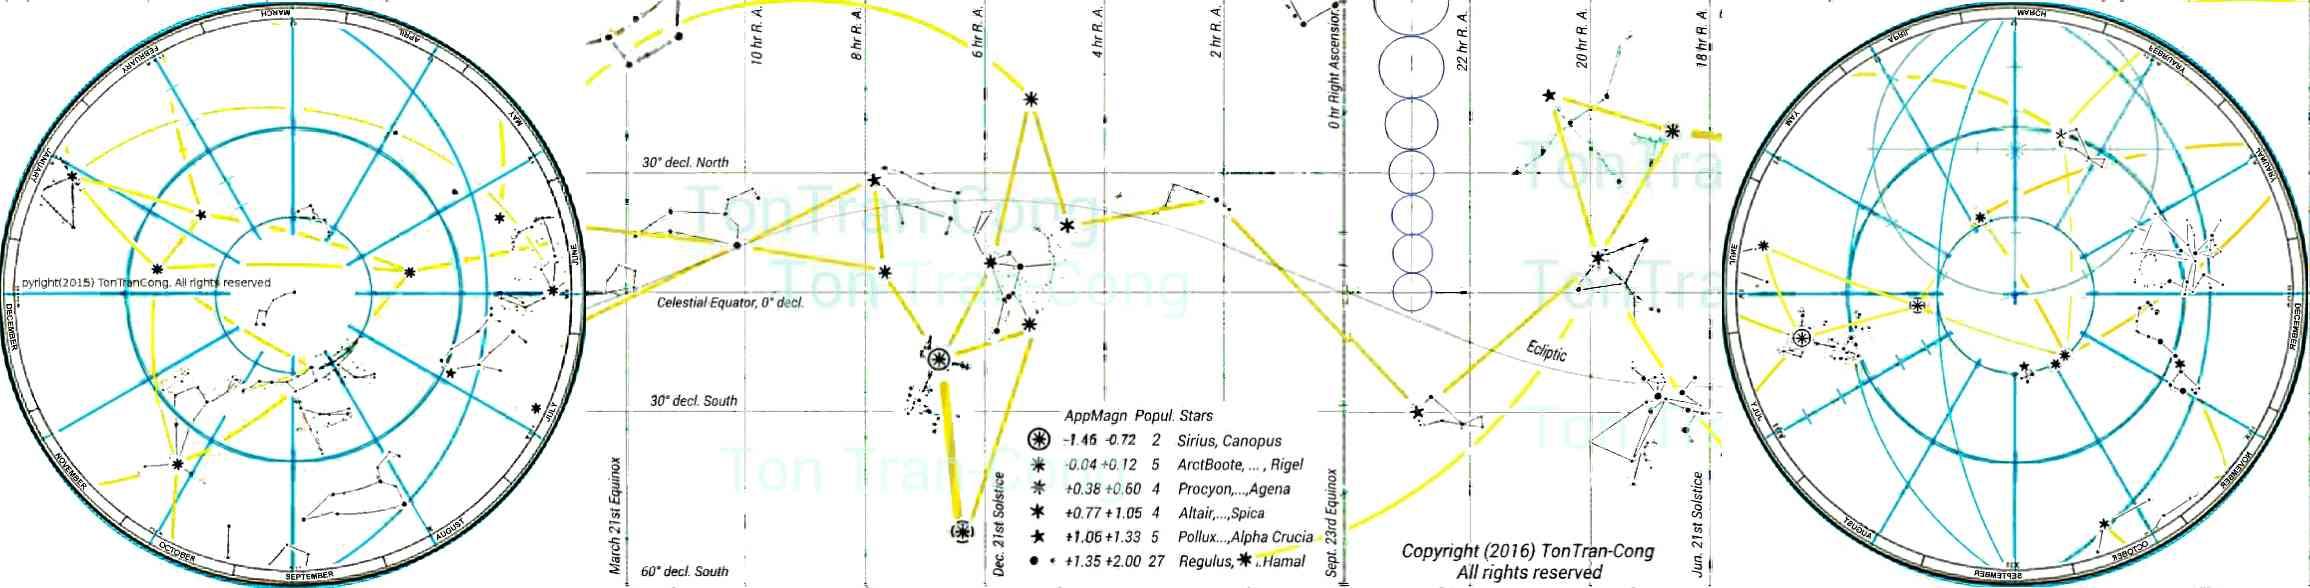 mercator8fx1.6polarc30.jpg